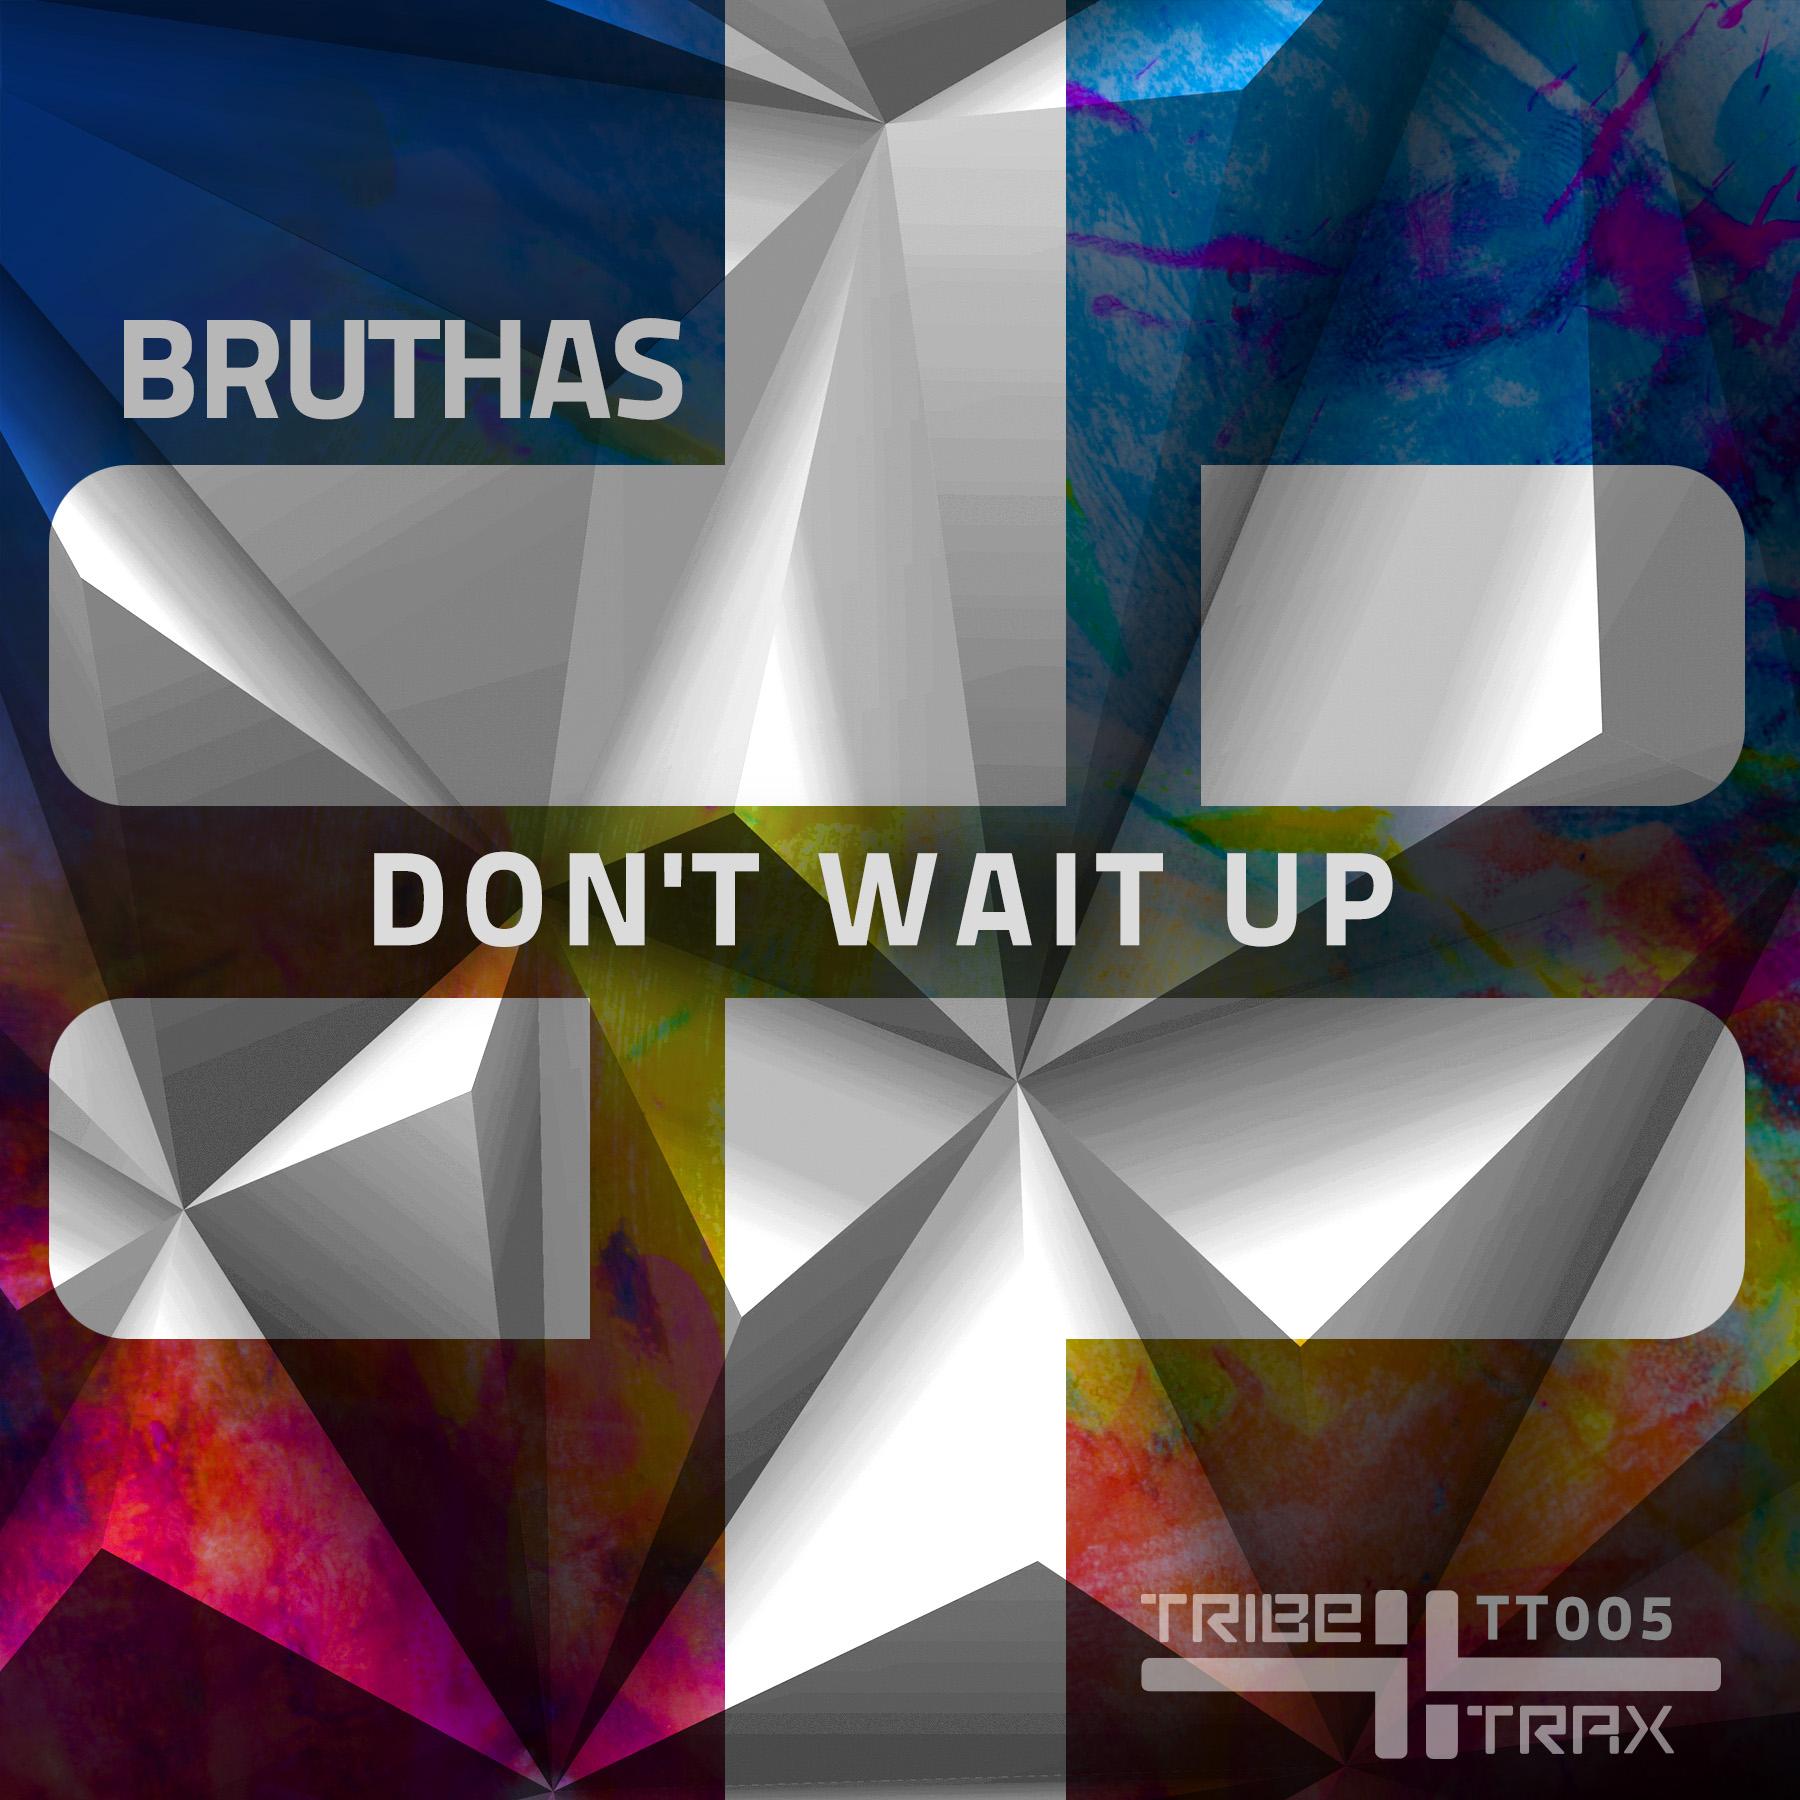 Don't Wait Up Bruthas